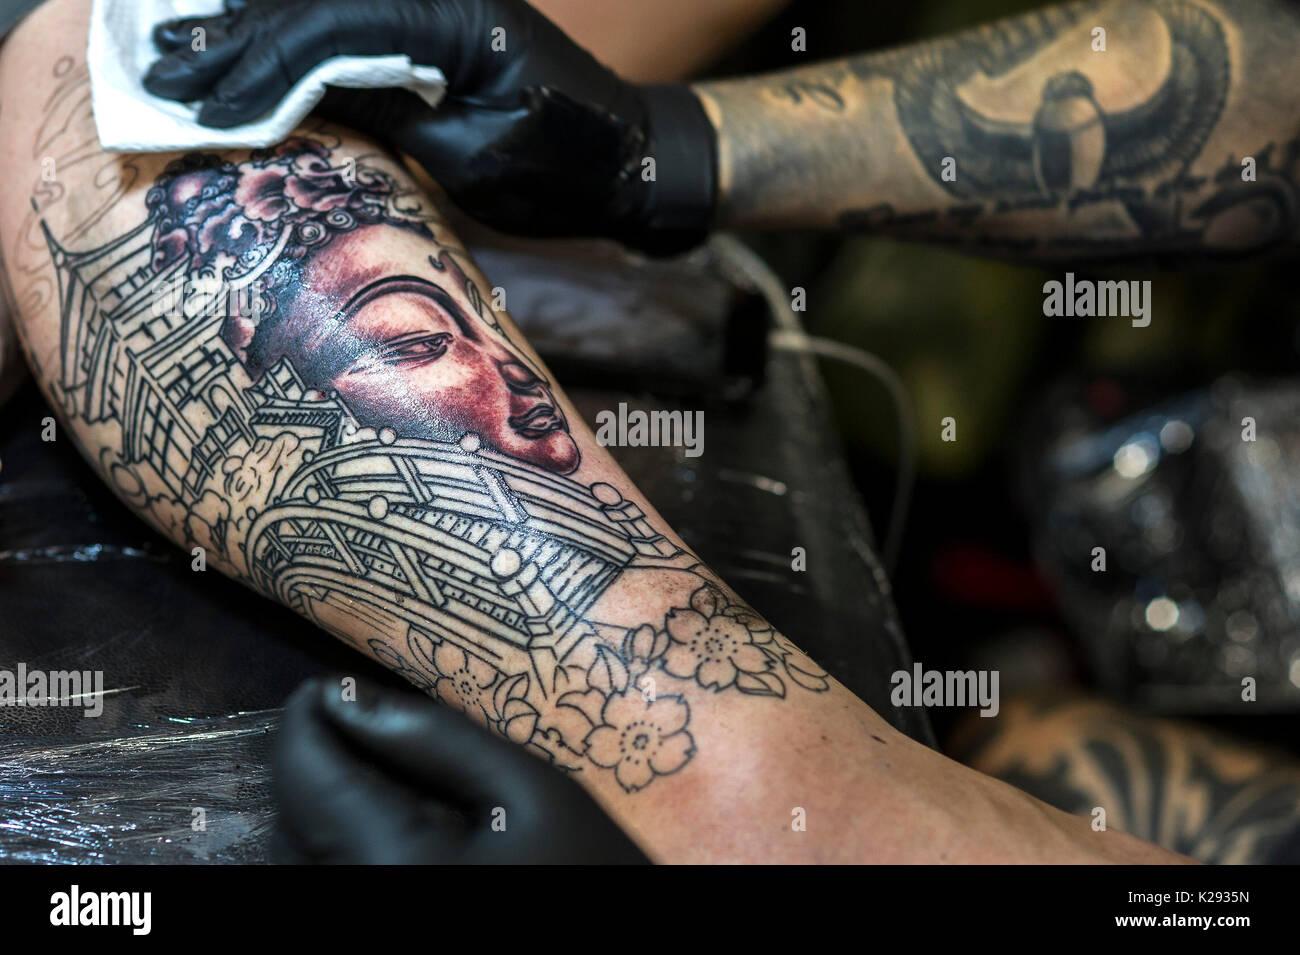 tatouage de la jambe photos & tatouage de la jambe images - alamy